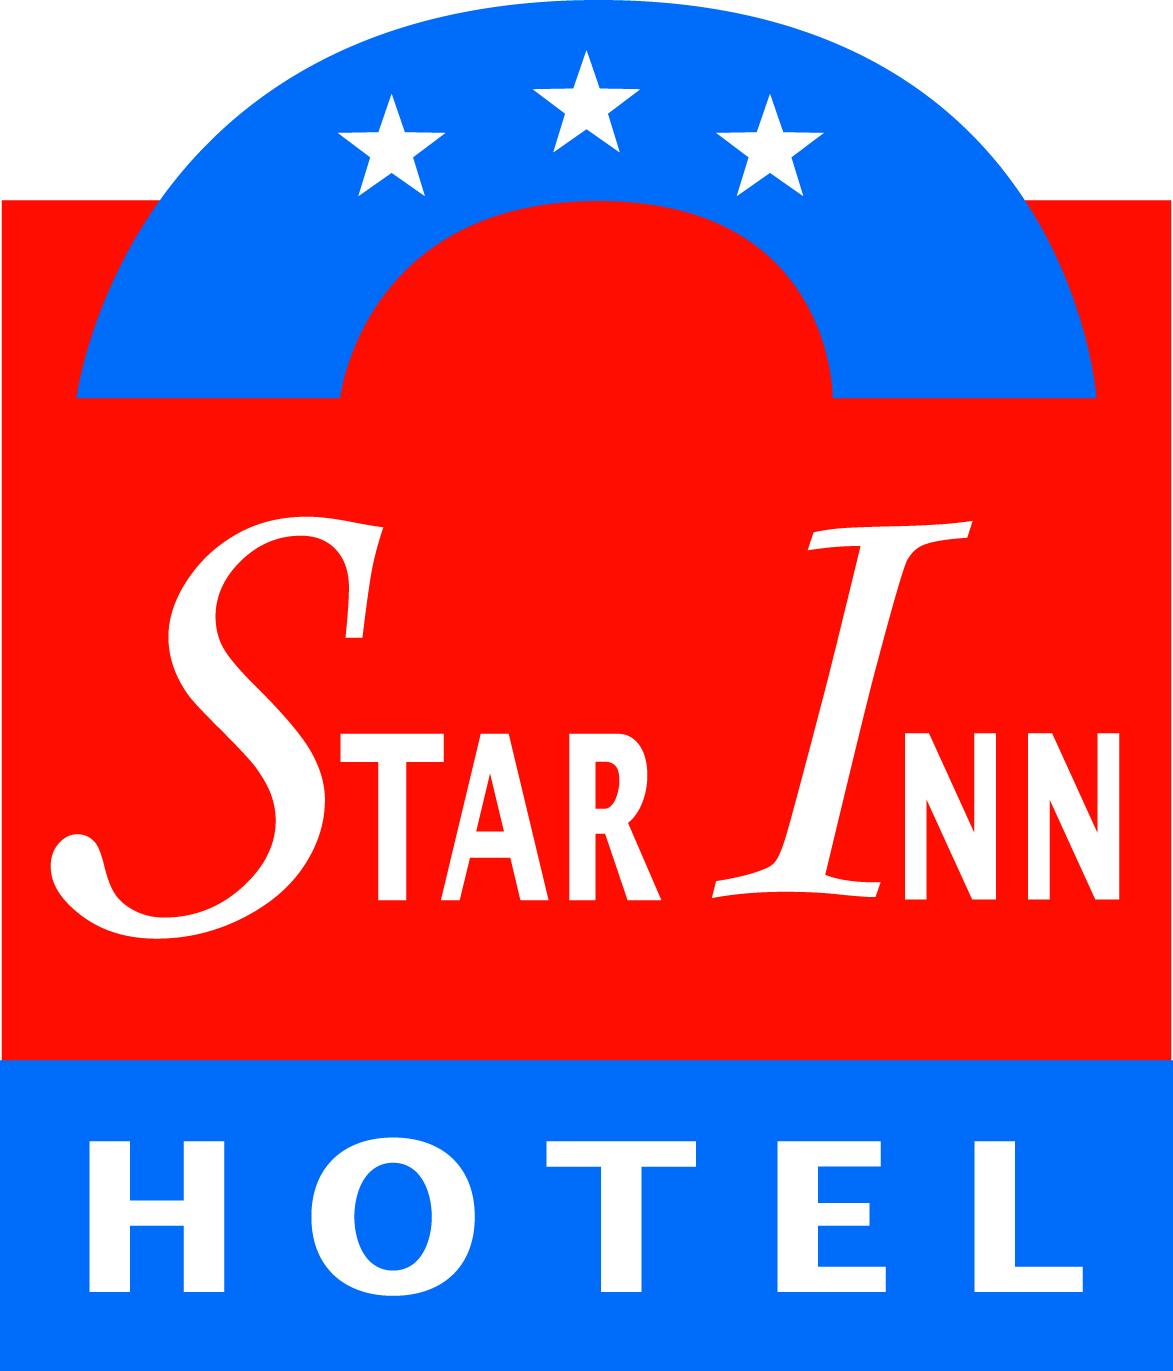 Star-Inn Hotel Salzburg